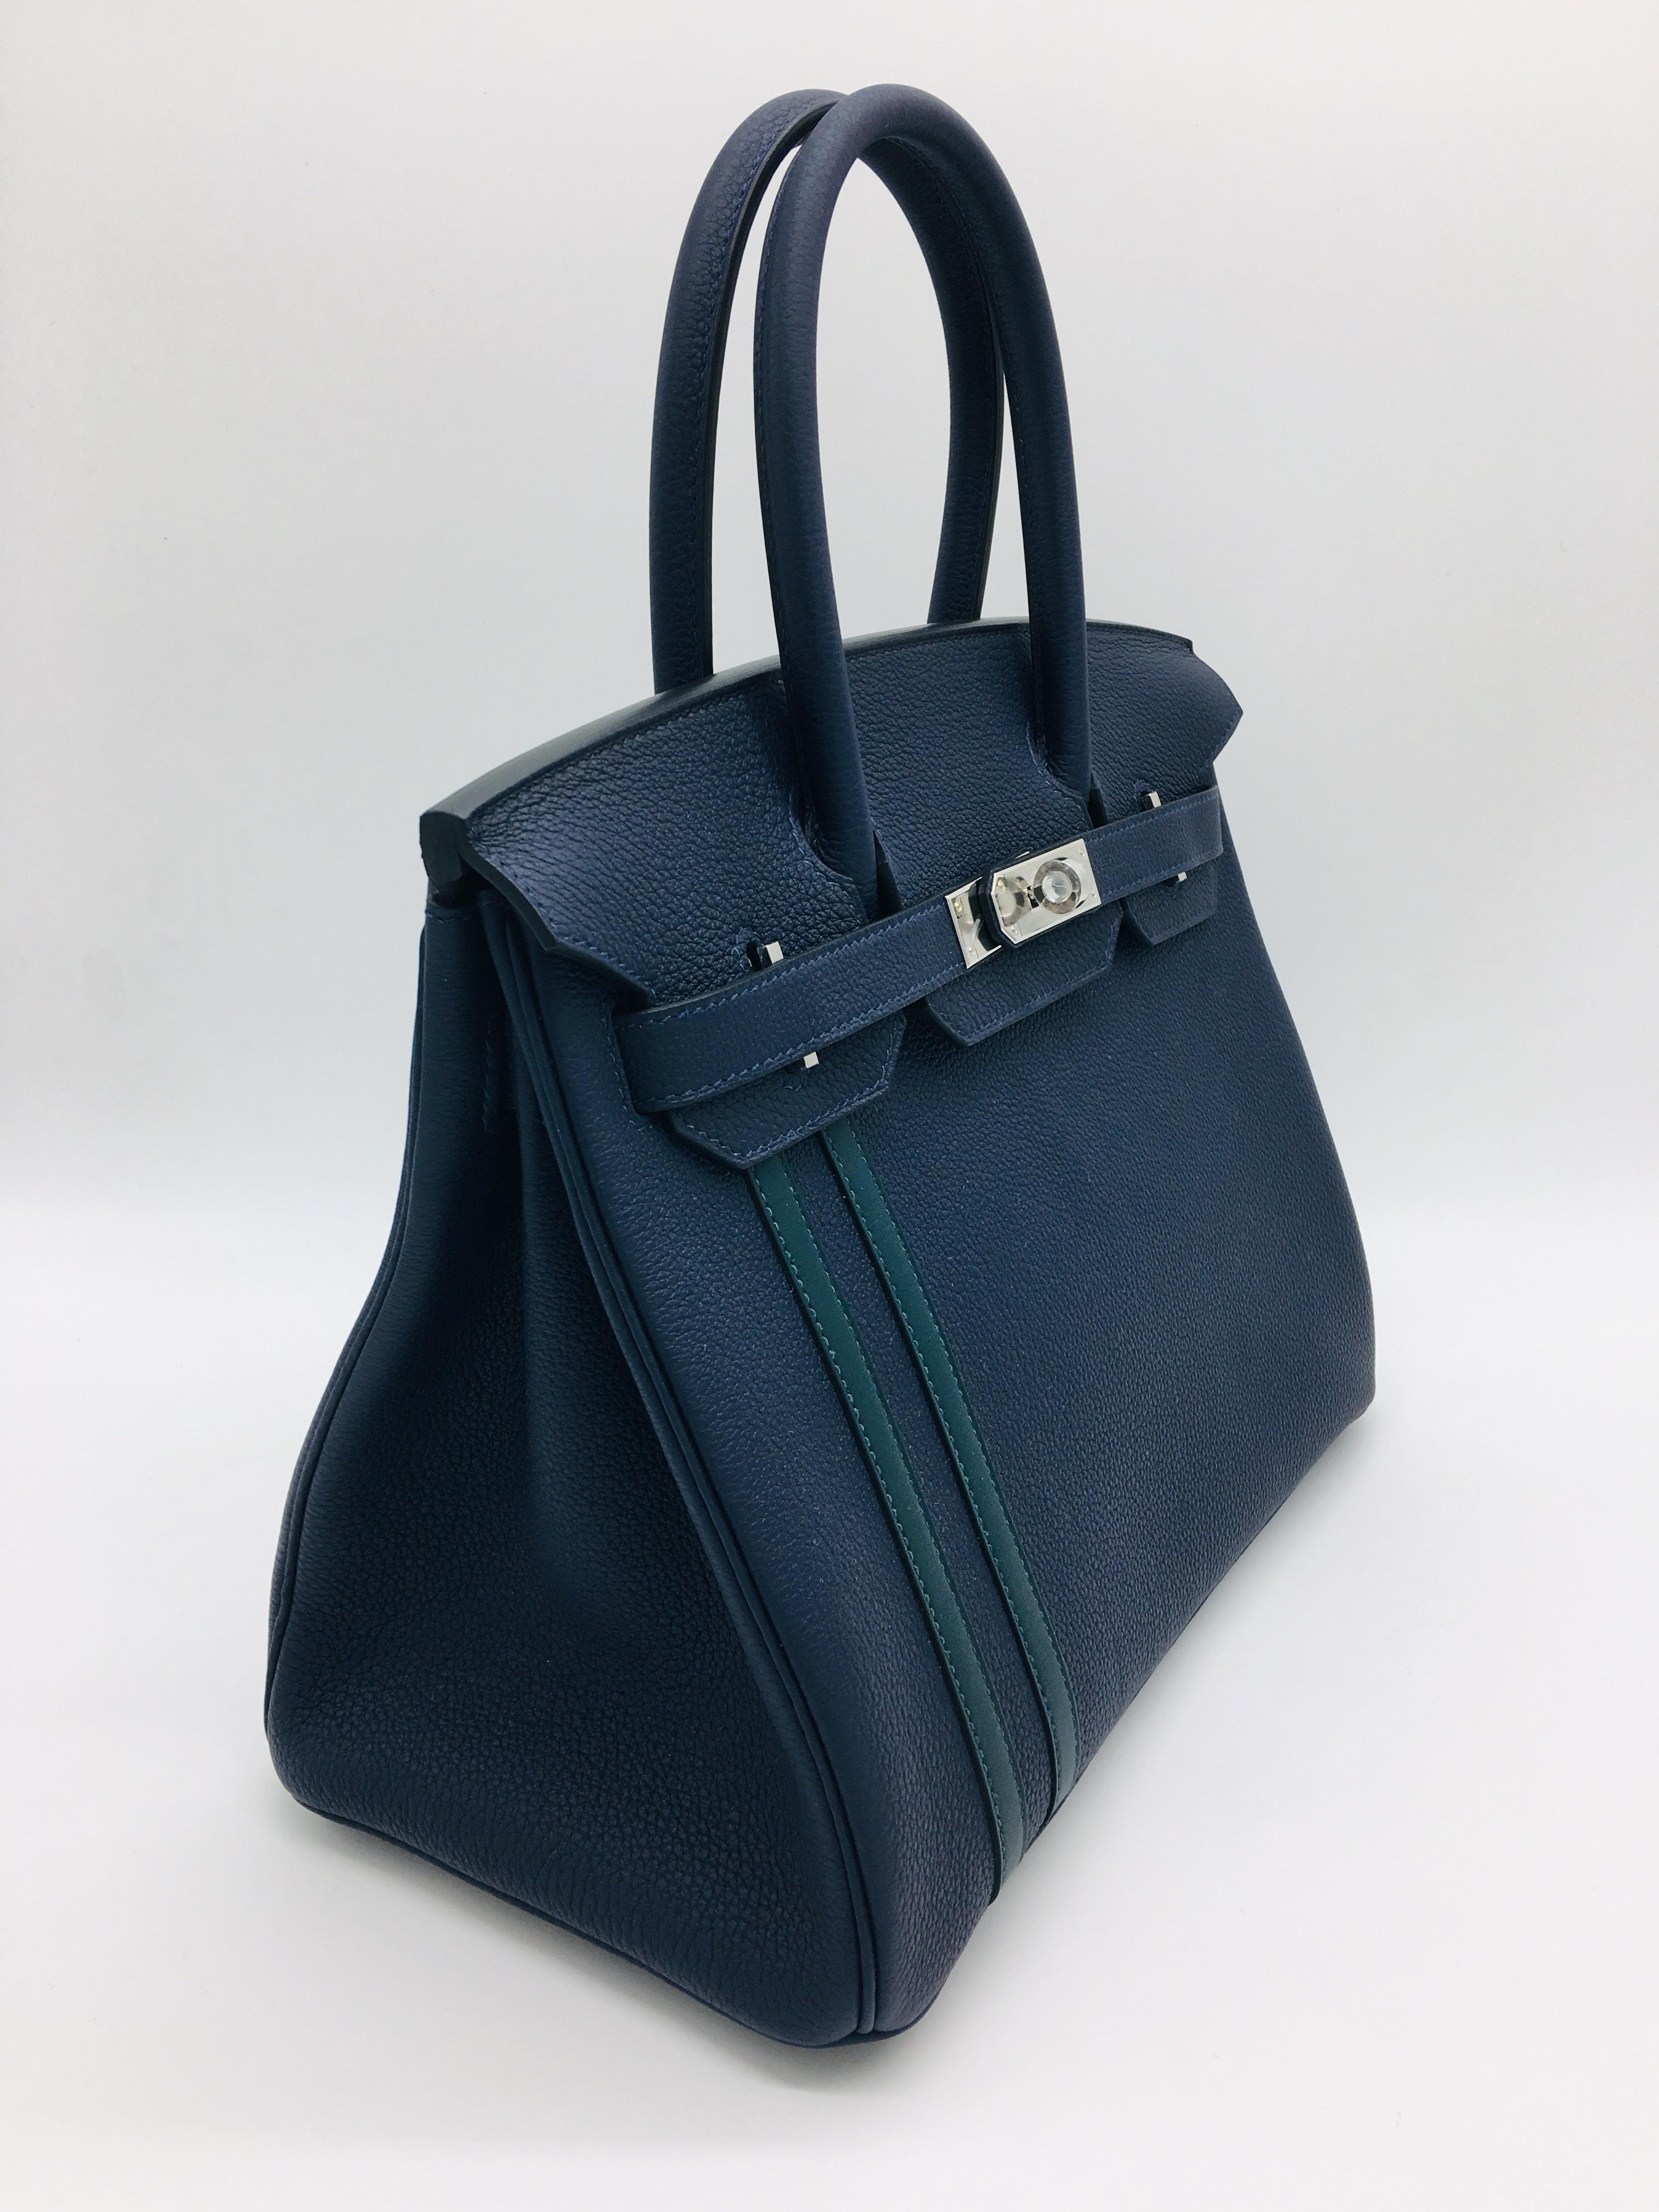 e7b11e5182 Hermes Birkin 30cm Officier Bleu Nuit Vert Cypress For Sale at 1stdibs